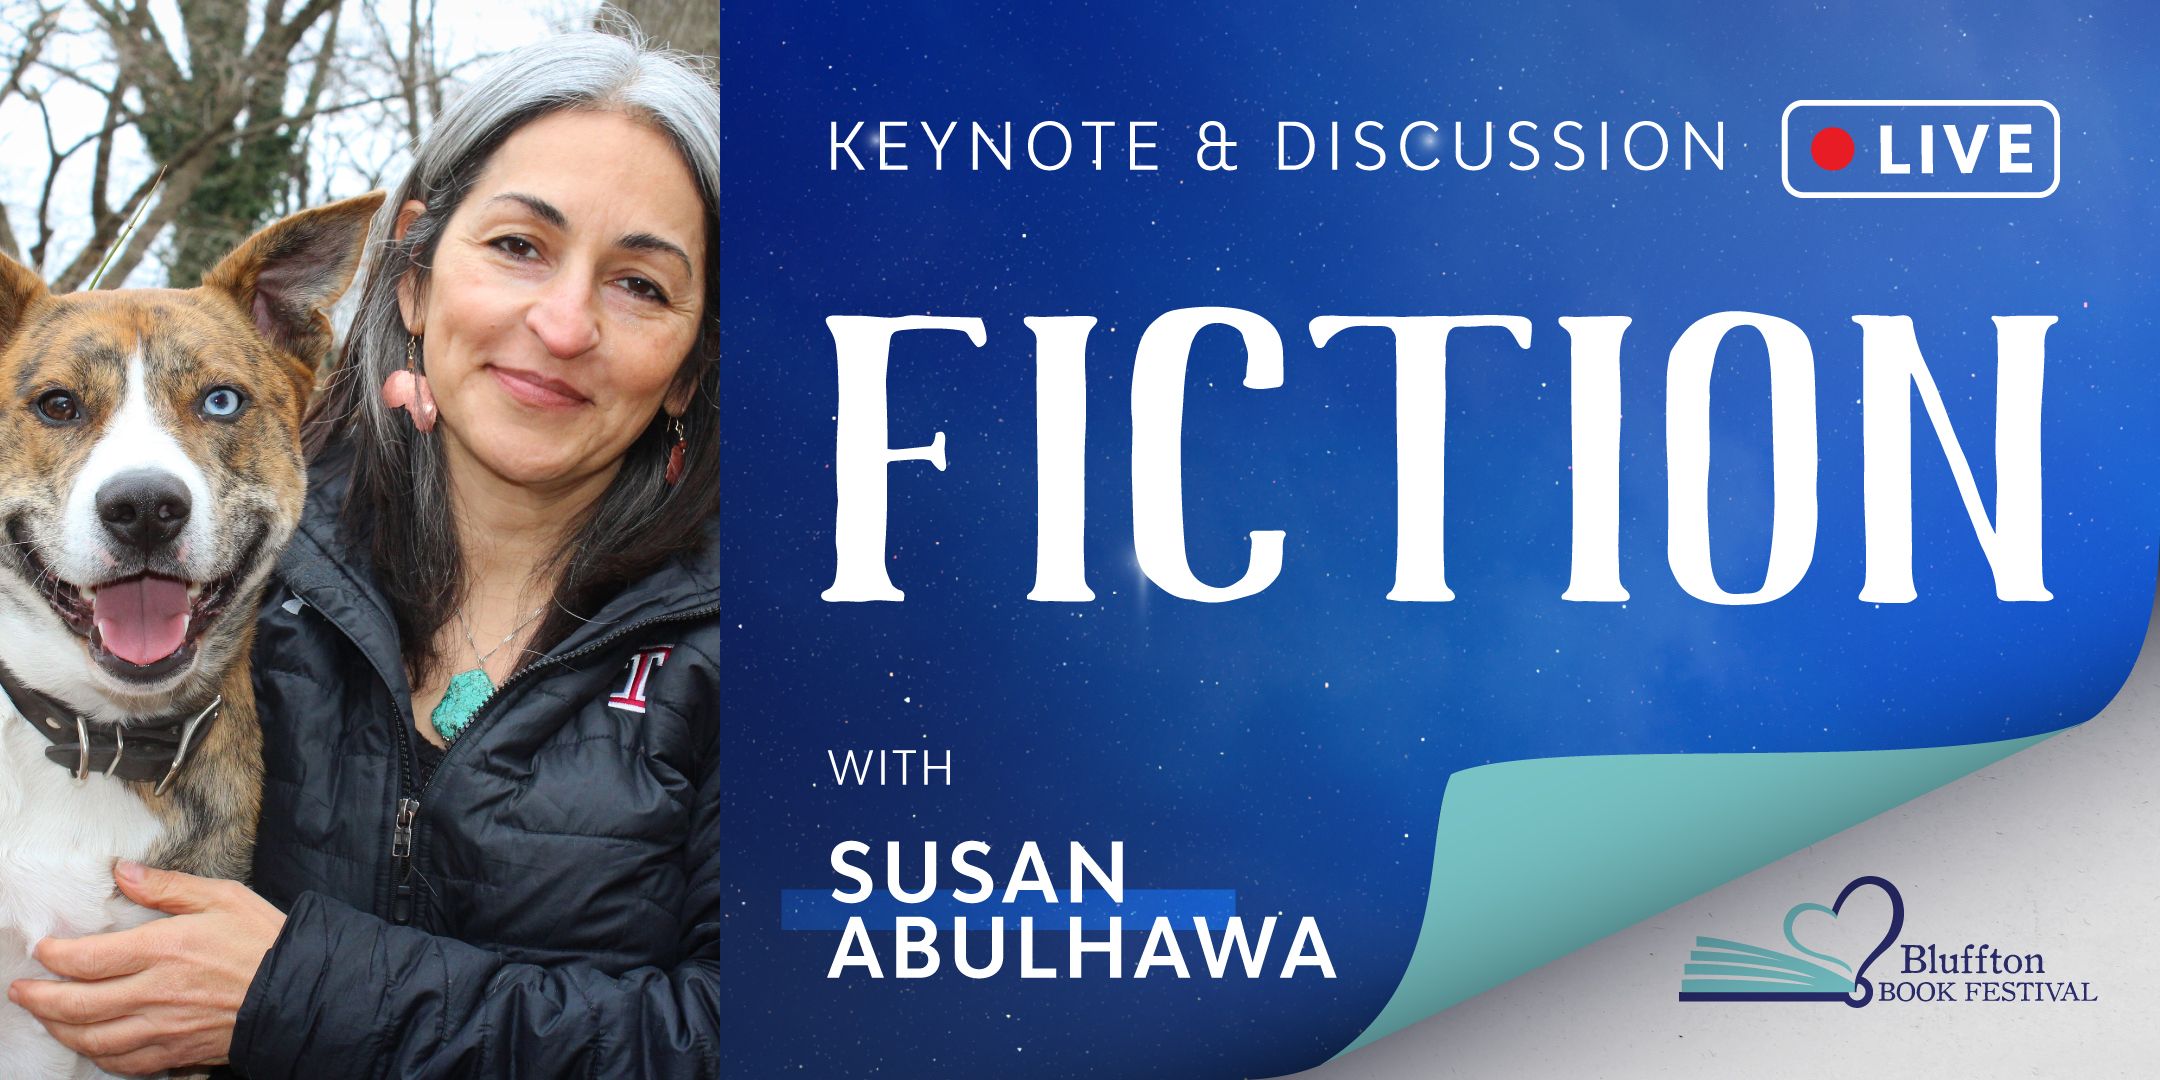 Fiction-BBF_Eventbrite